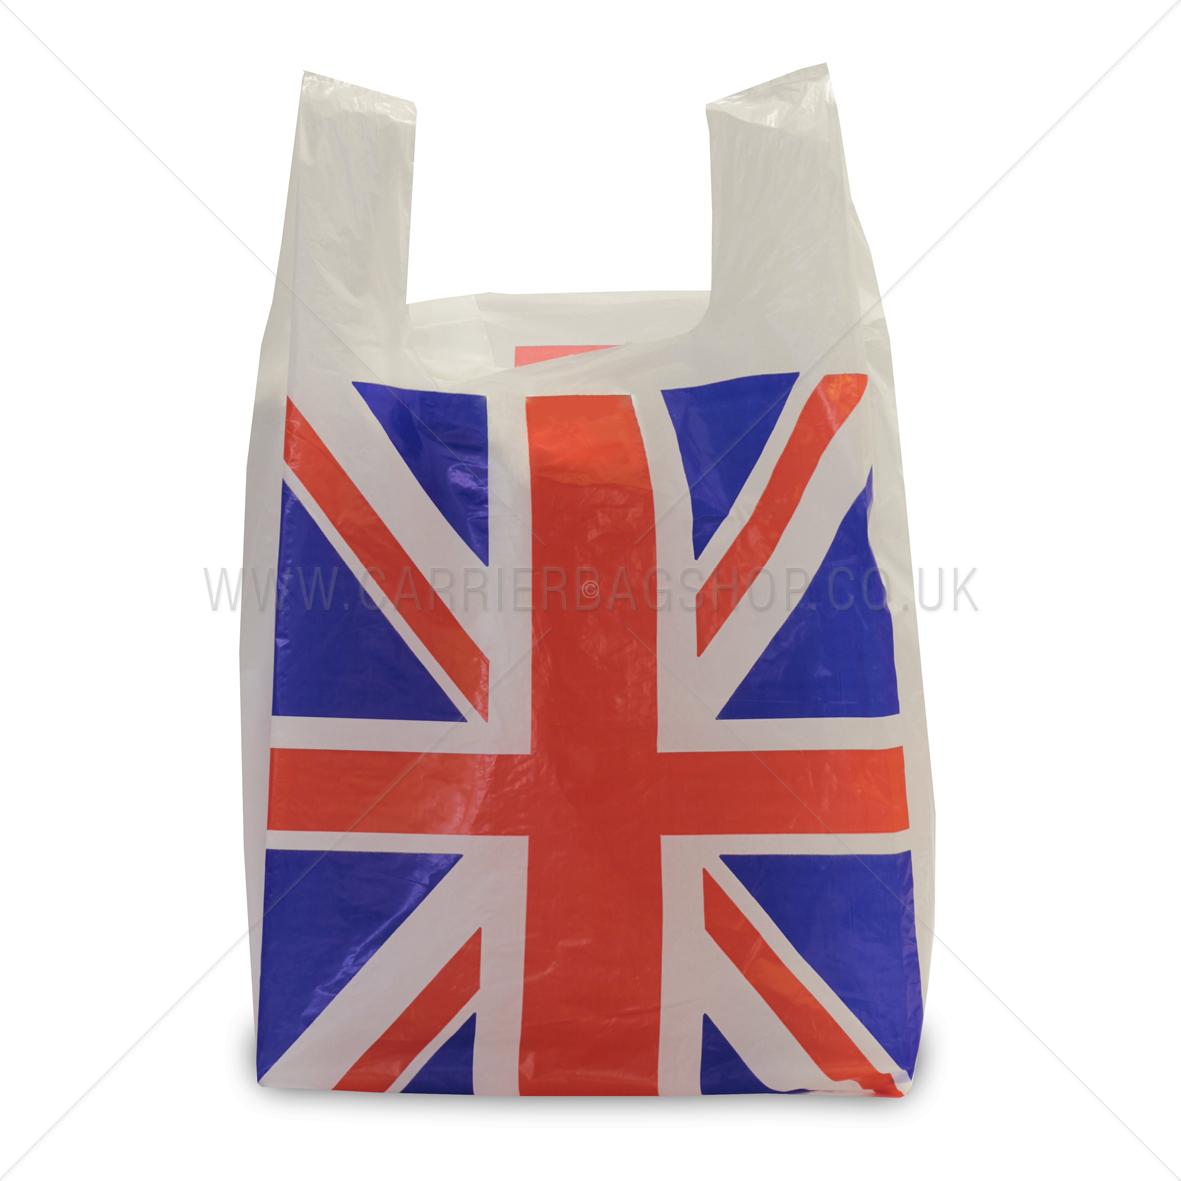 Union Jack Standard White Vest Style Plastic Carrier Bags